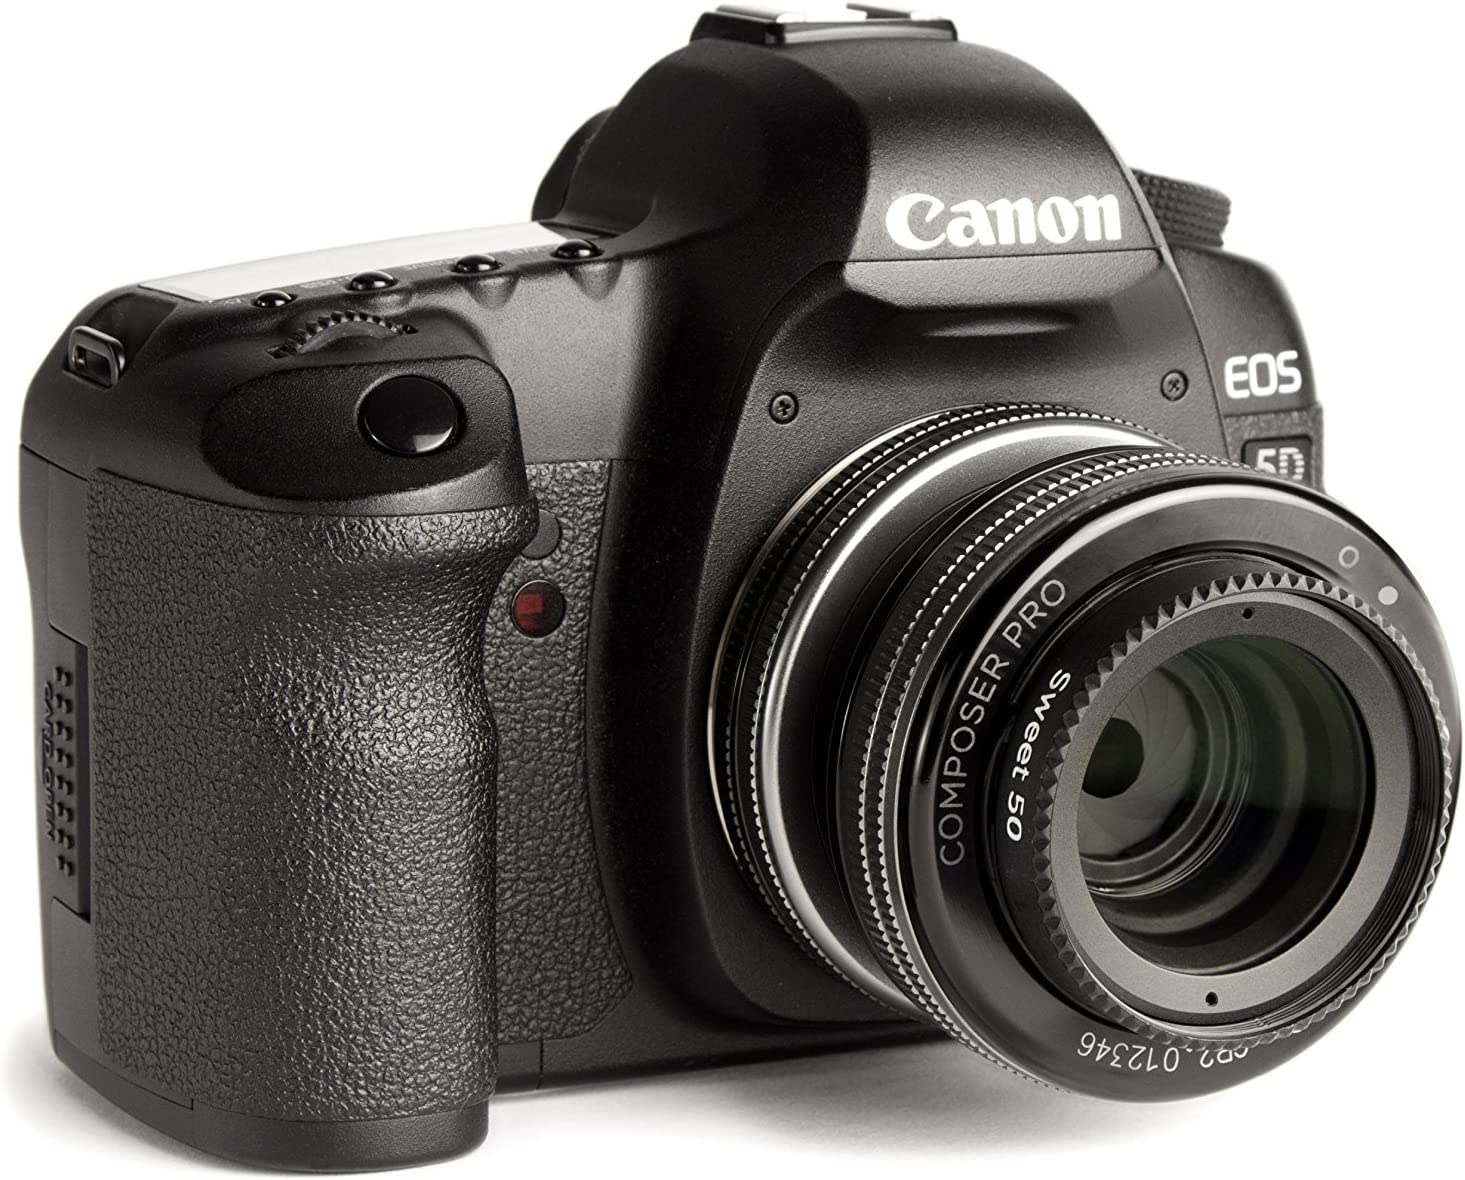 Lensbaby Lb 3u8c Composer Pro Ii Mit Sweet 50 Optik Für Kamera